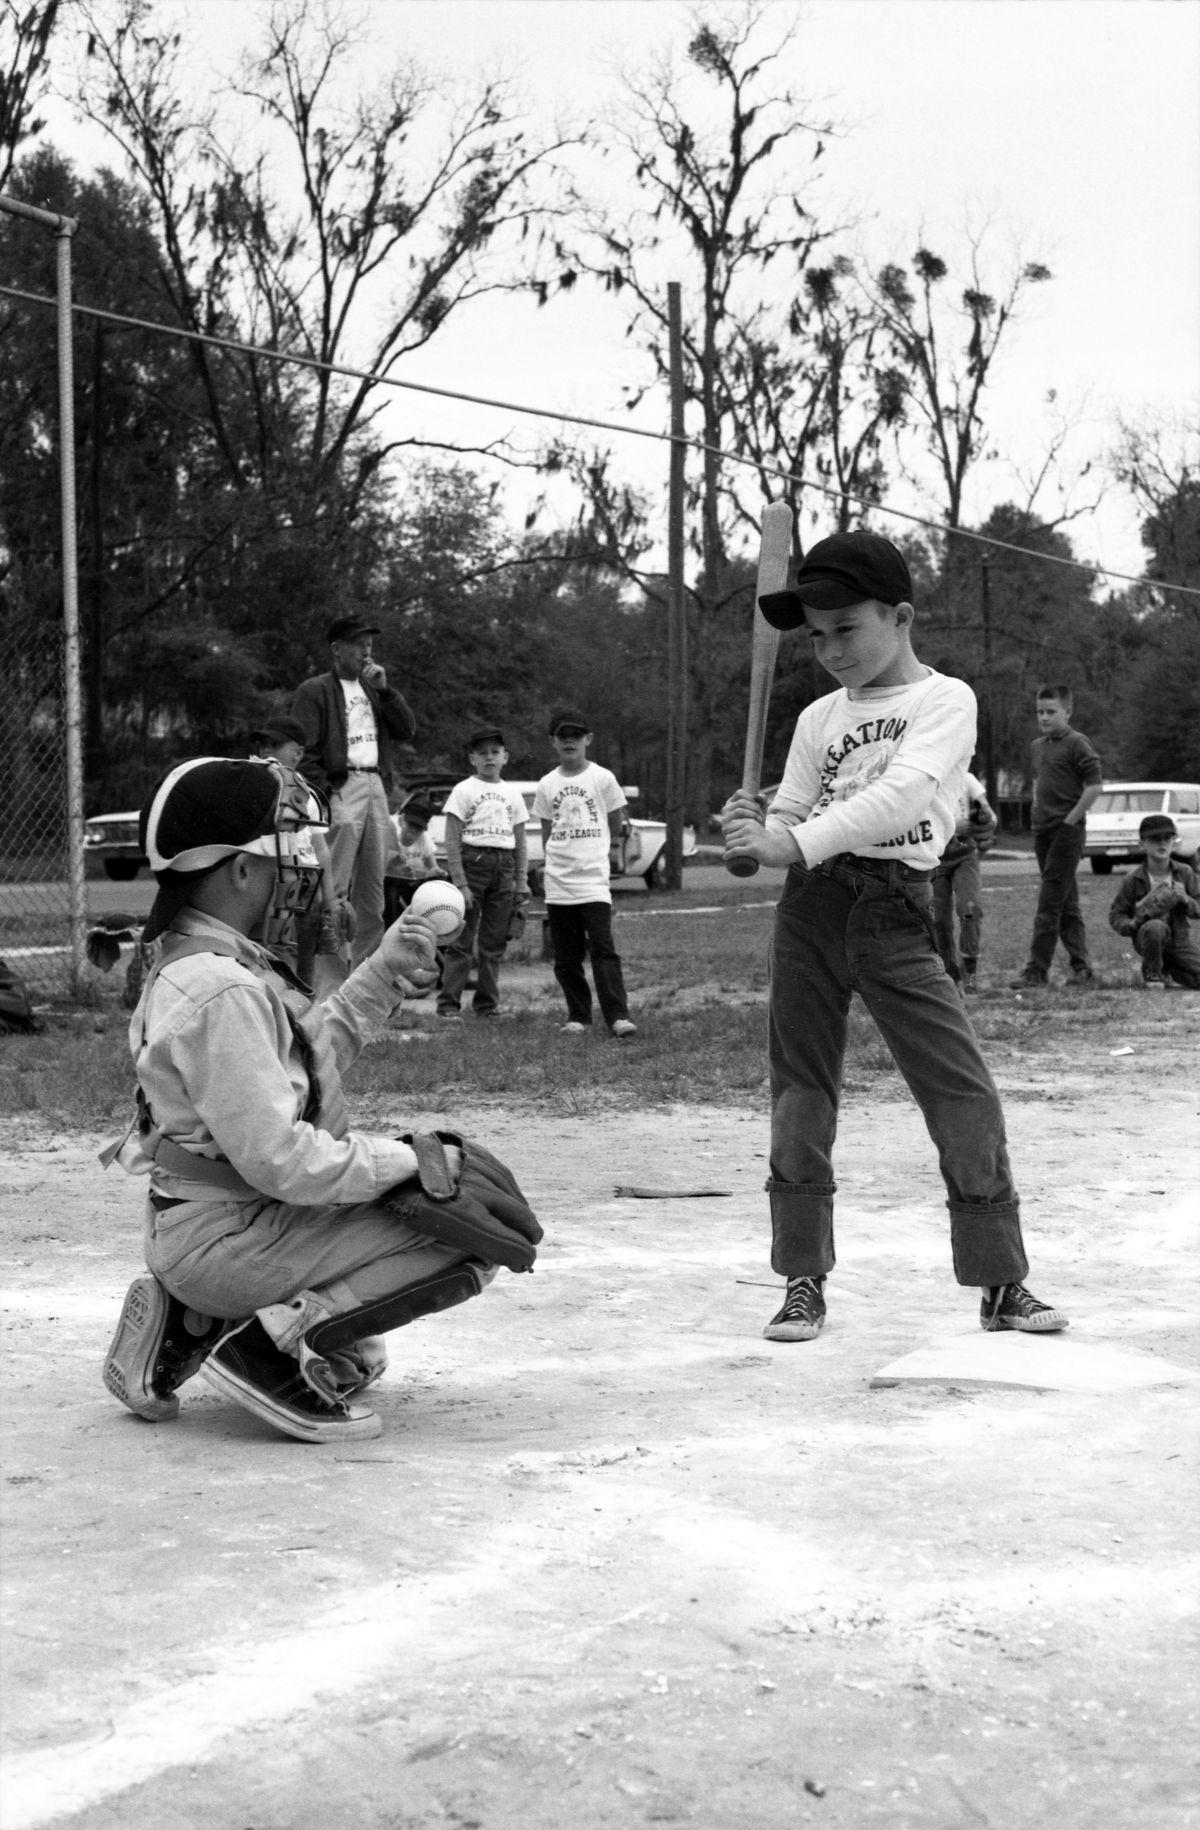 Tallahassee Recreation Department baseball game.